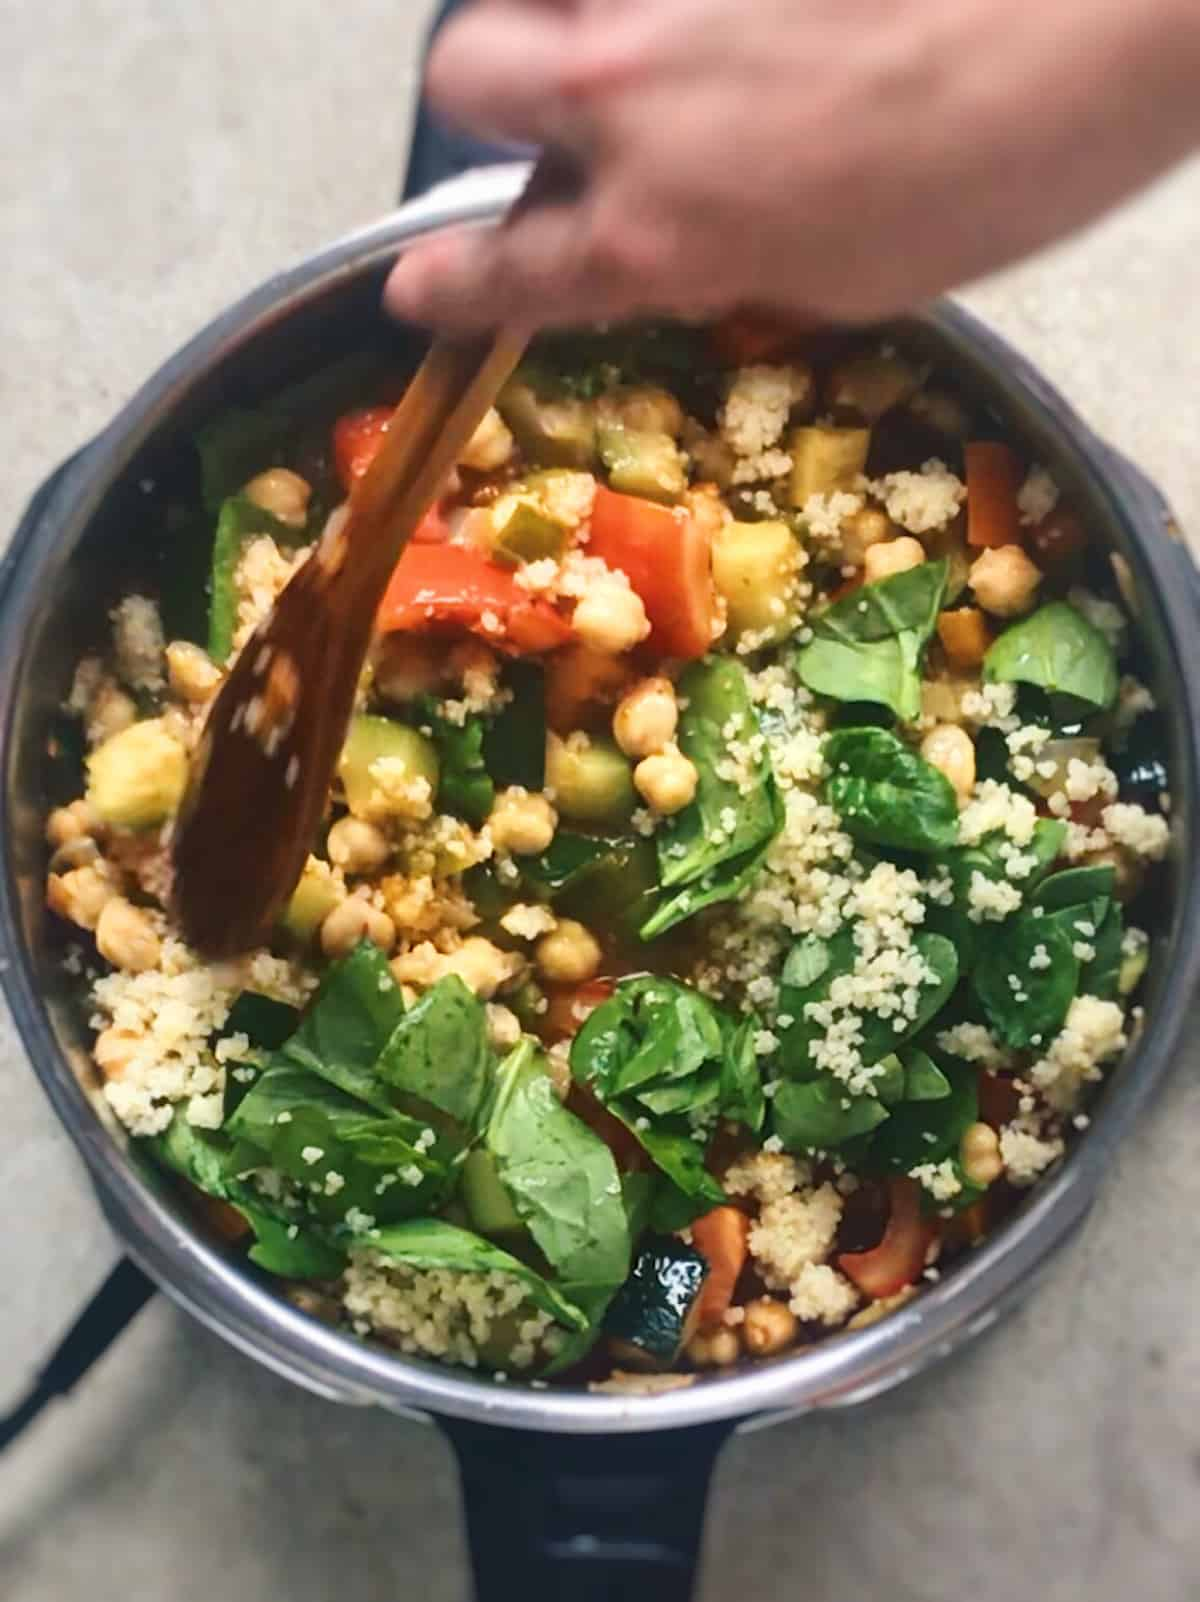 Receta sana de minestrone